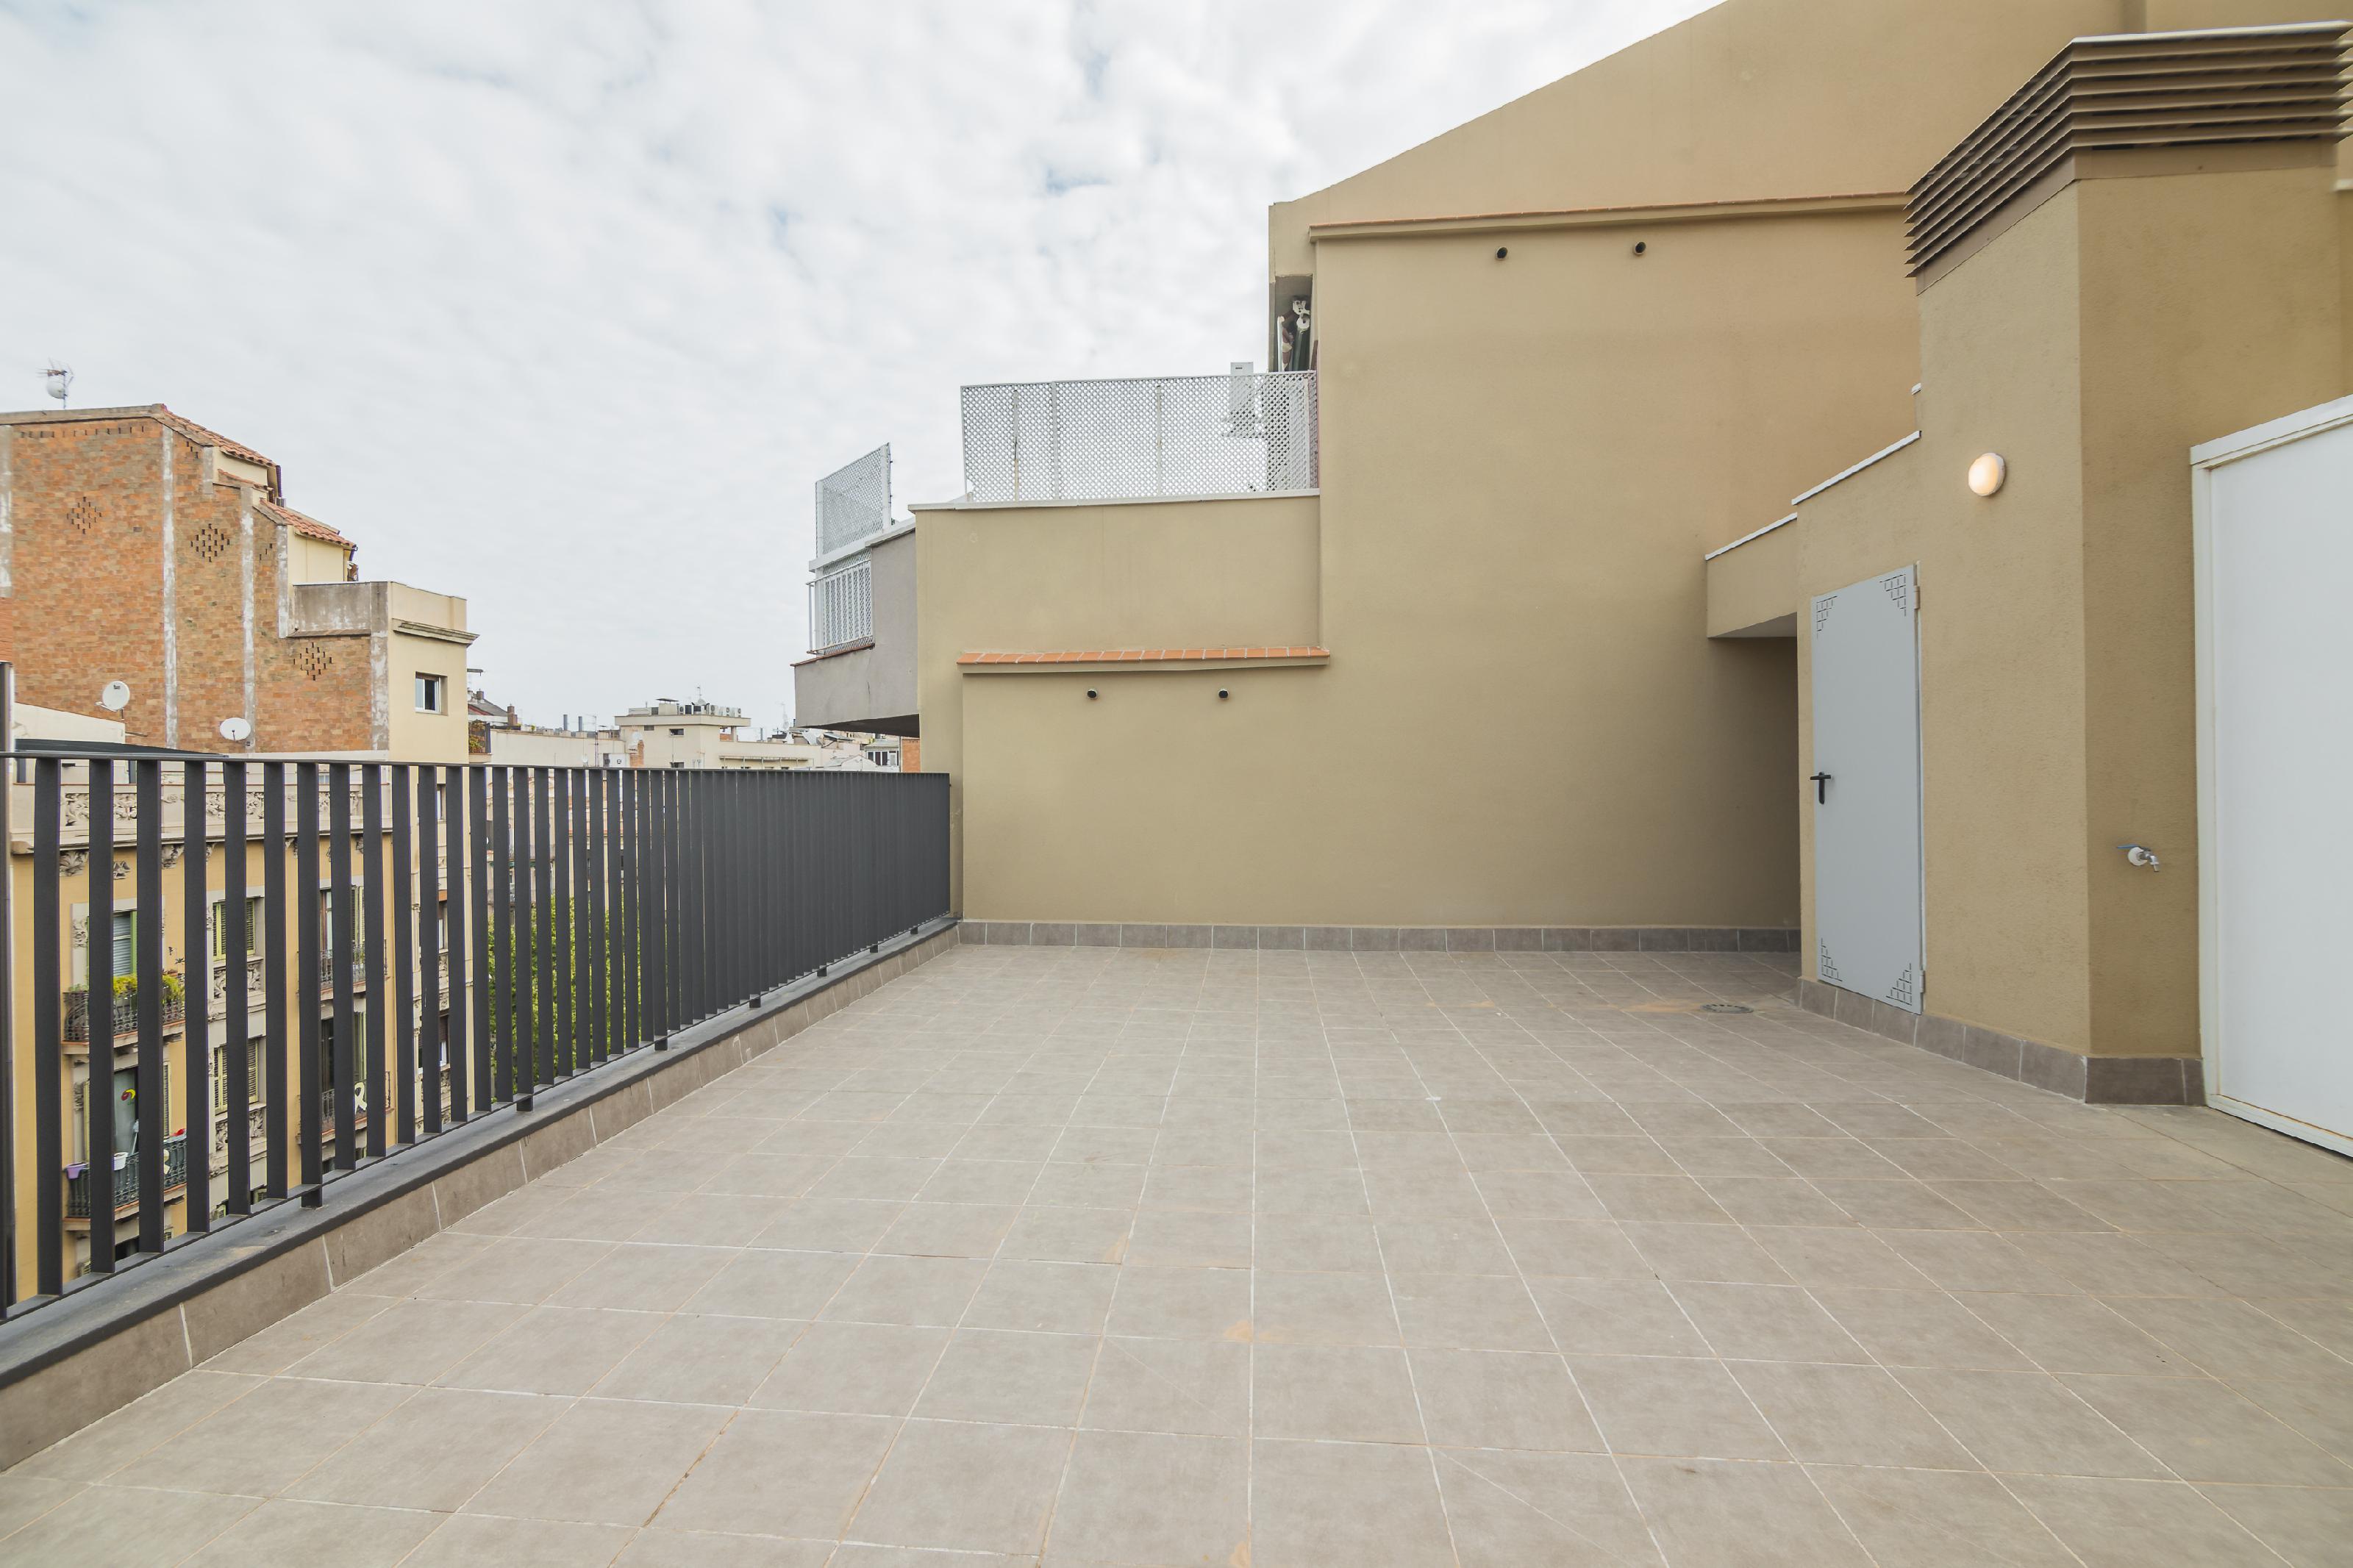 249858 Flat for sale in Eixample, Nova Esquerra Eixample 20